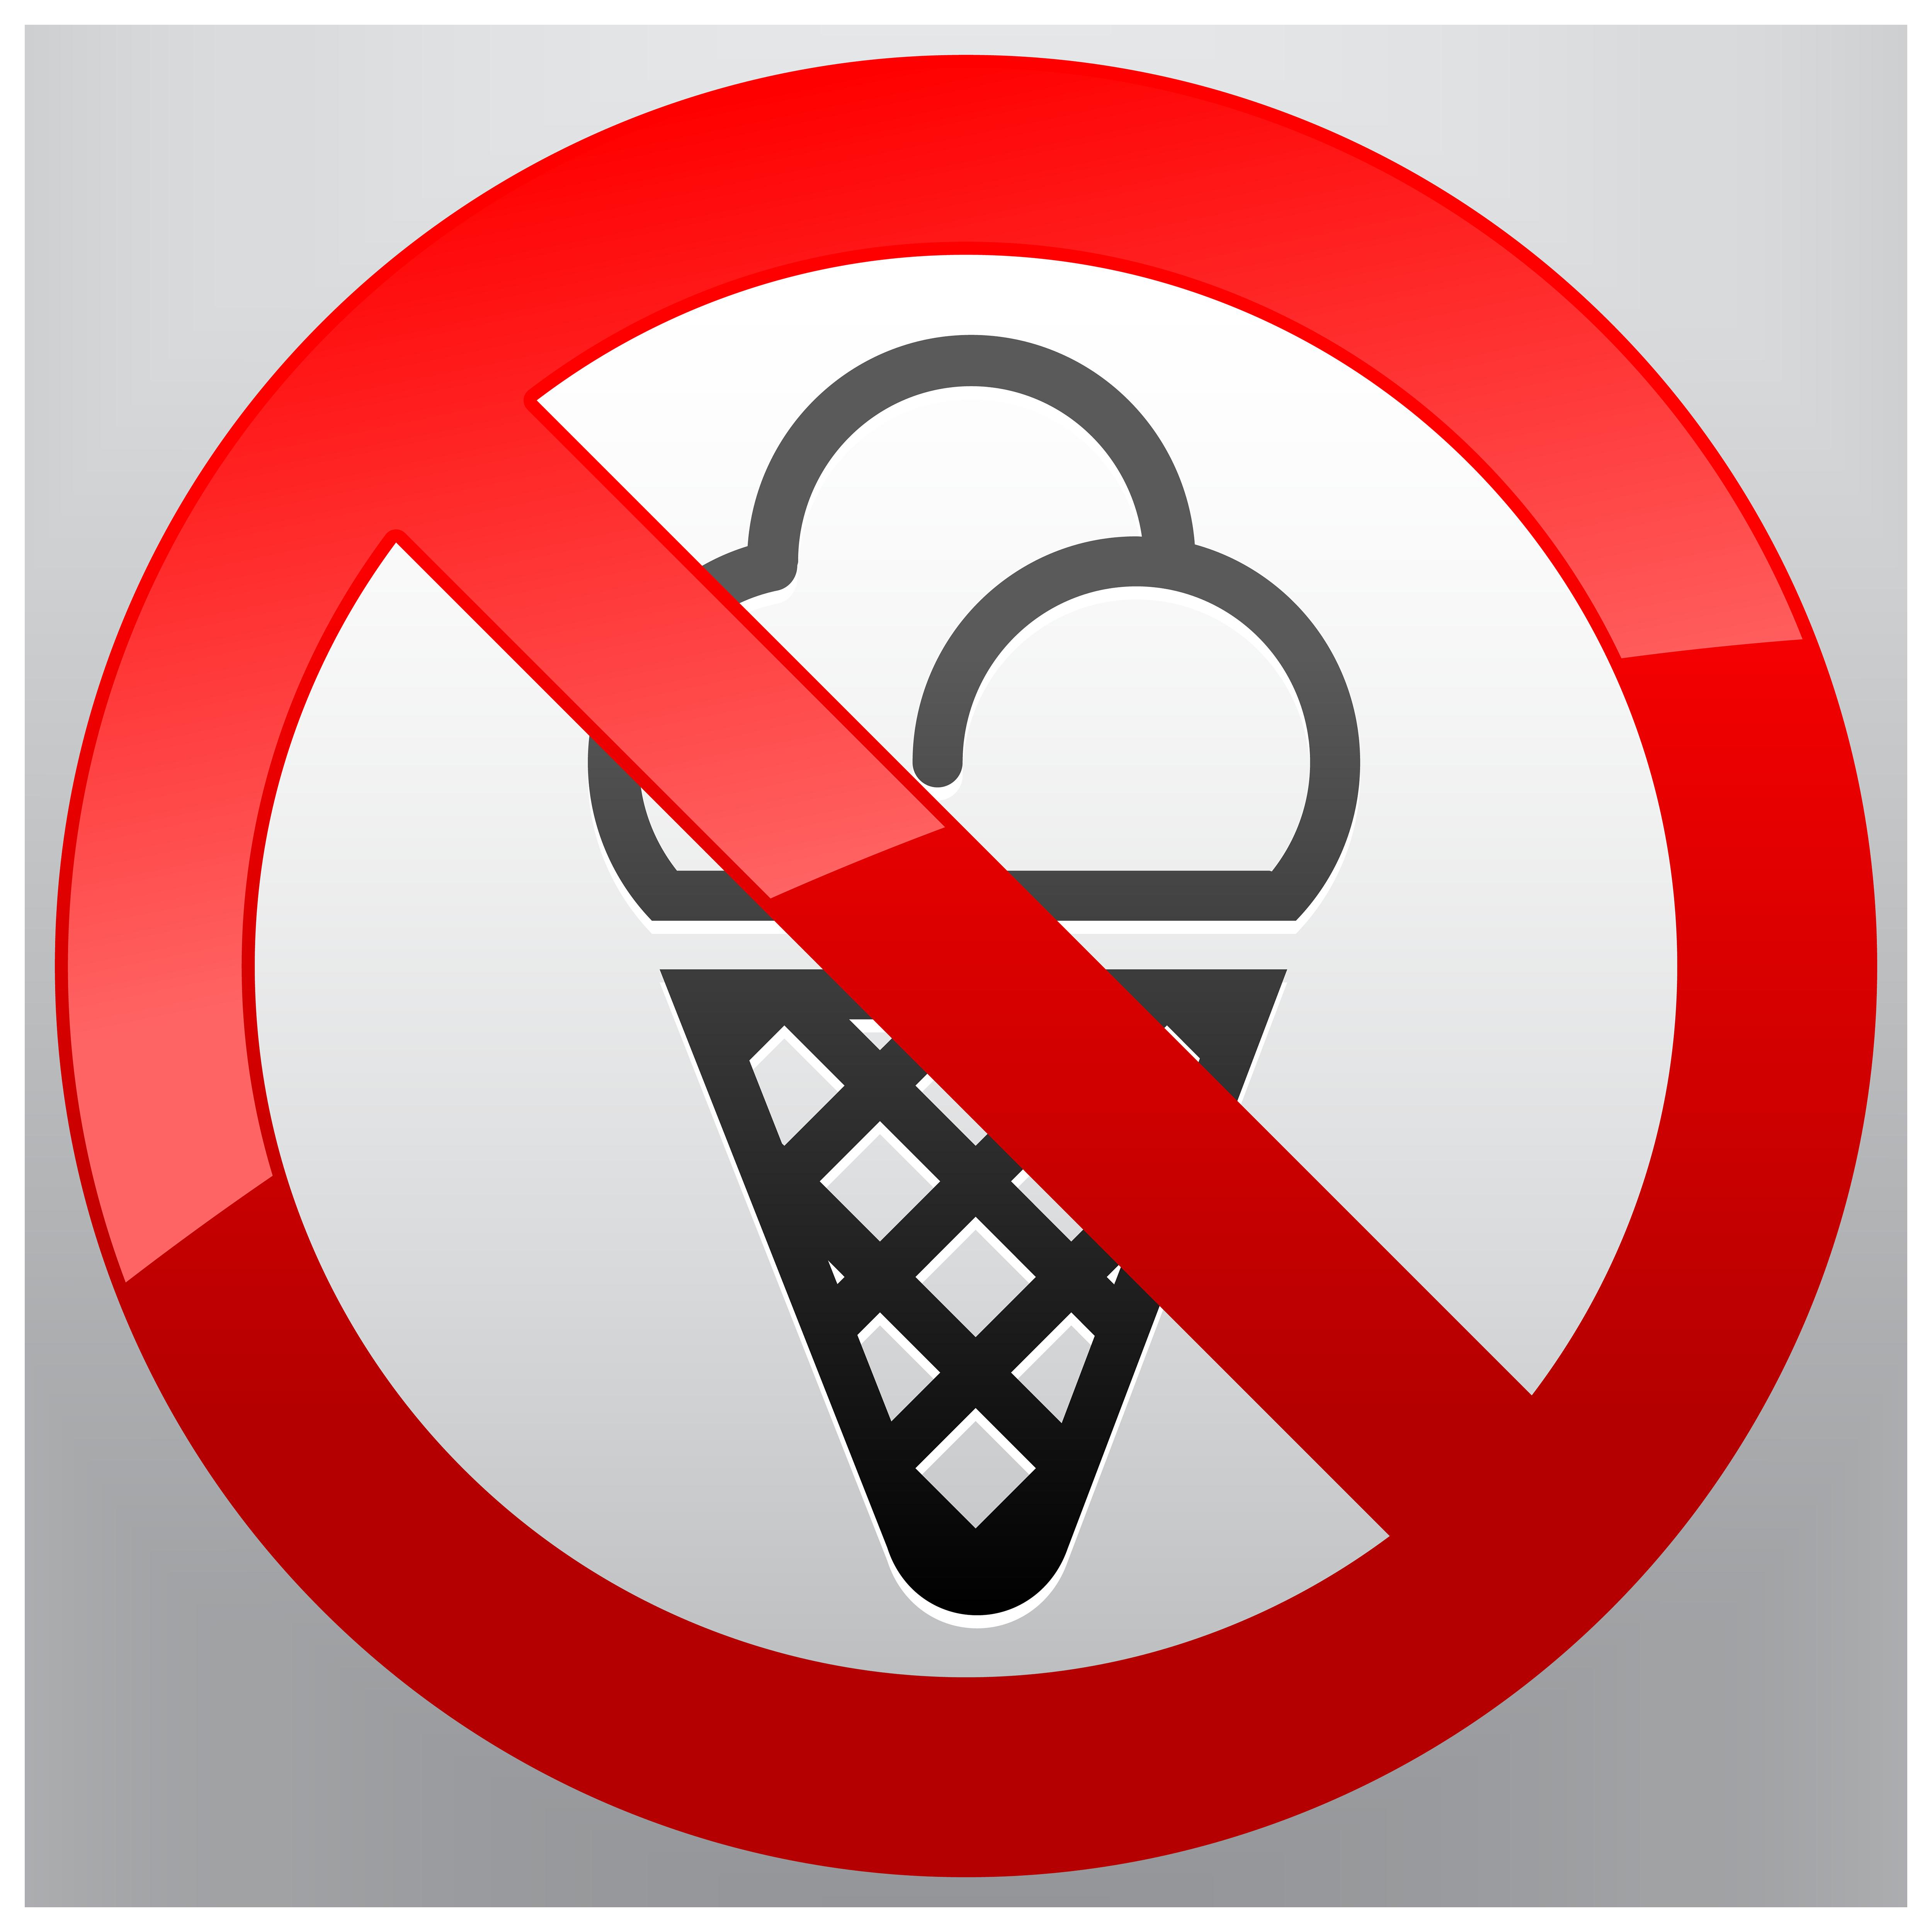 clip transparent library No clipart. Ice cream prohibition sign